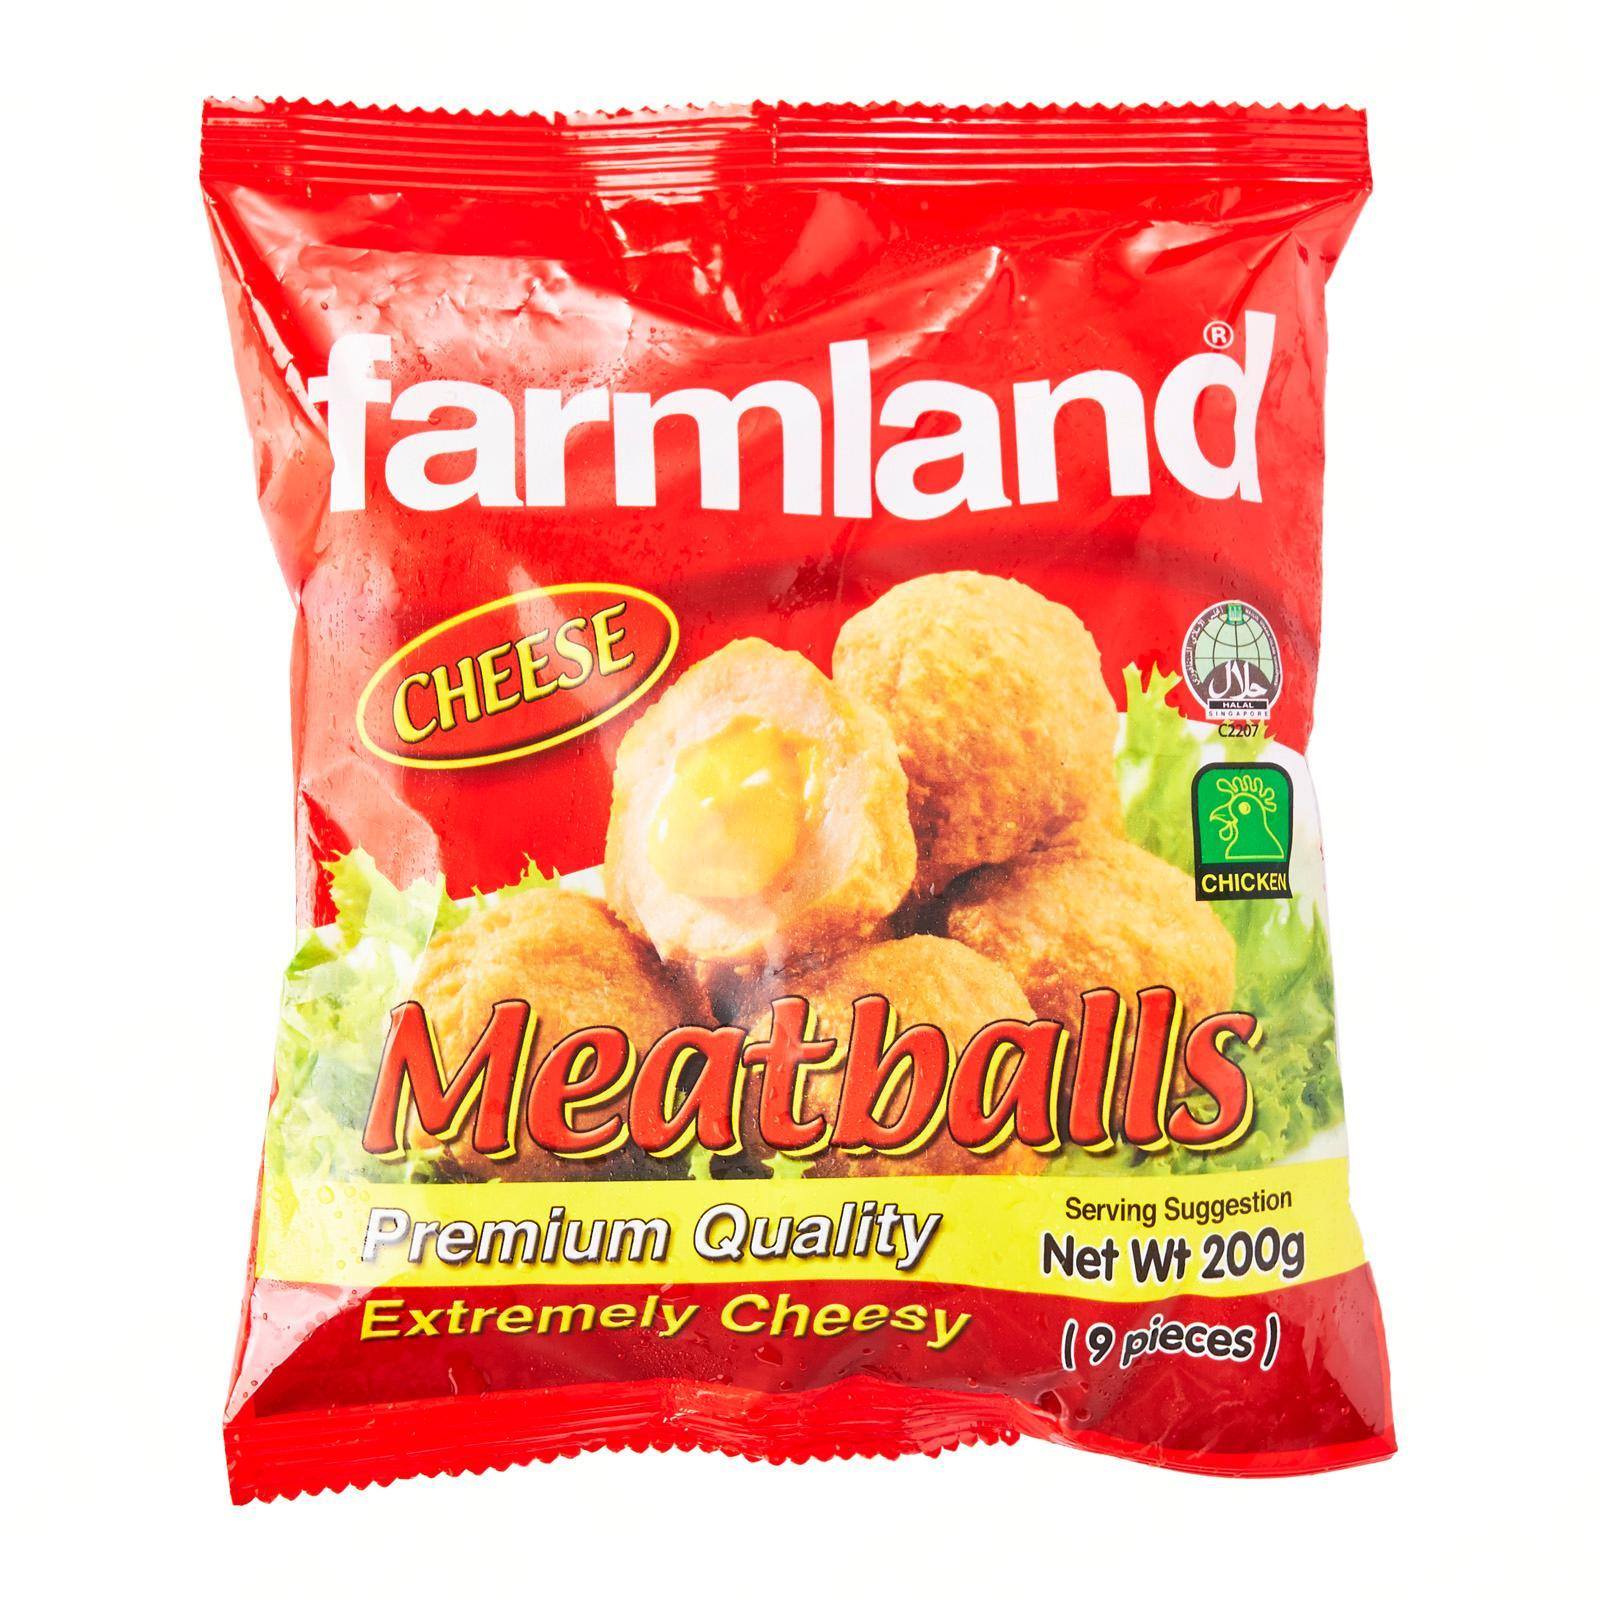 Farmland Cheese Chicken Meatballs - Frozen